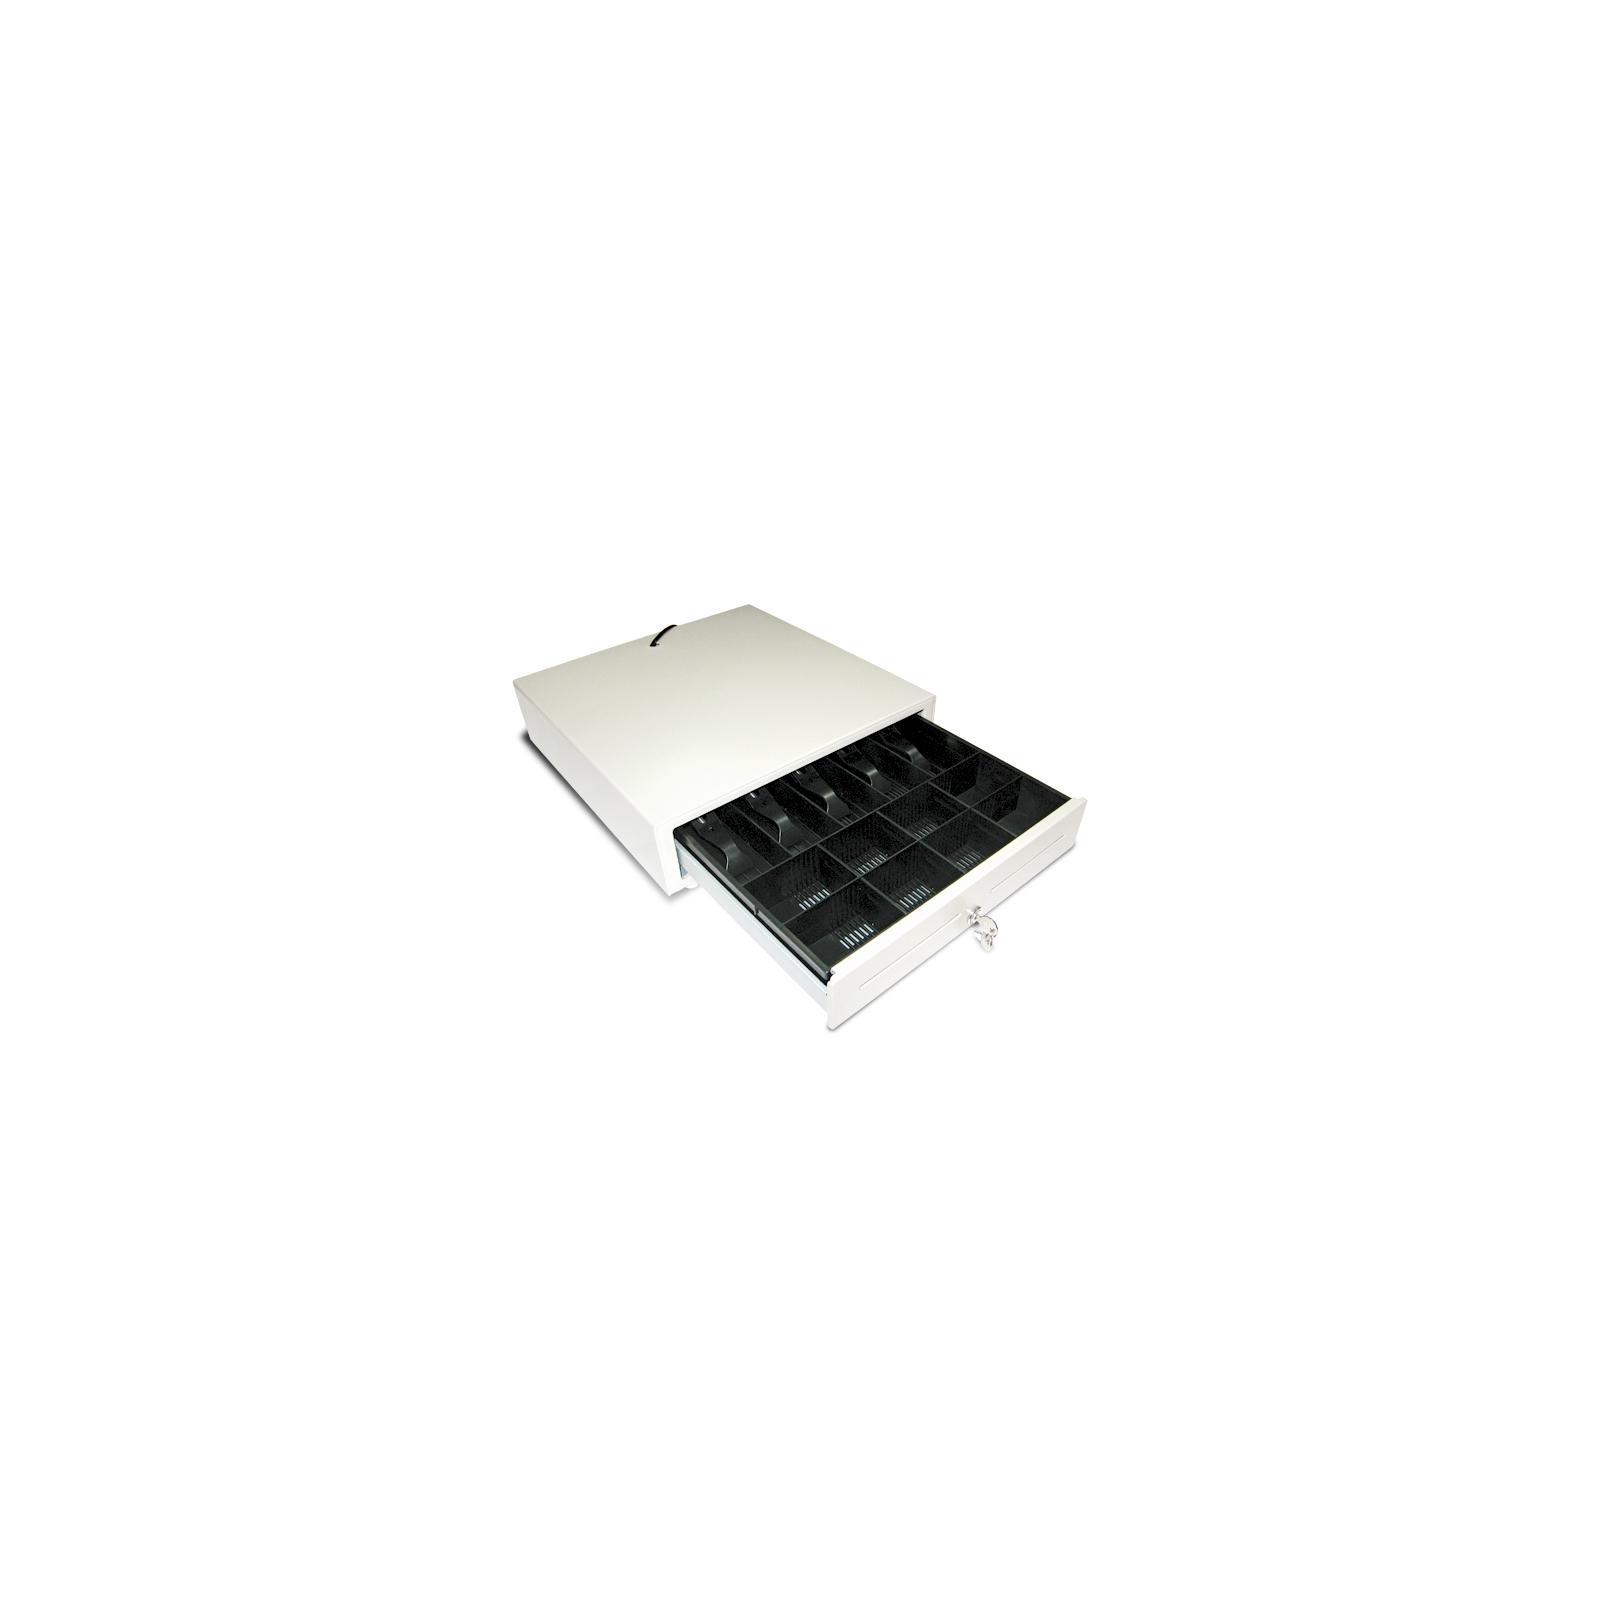 Денежный ящик Unisystem UNIQ-CB41.01 White (01359) изображение 2